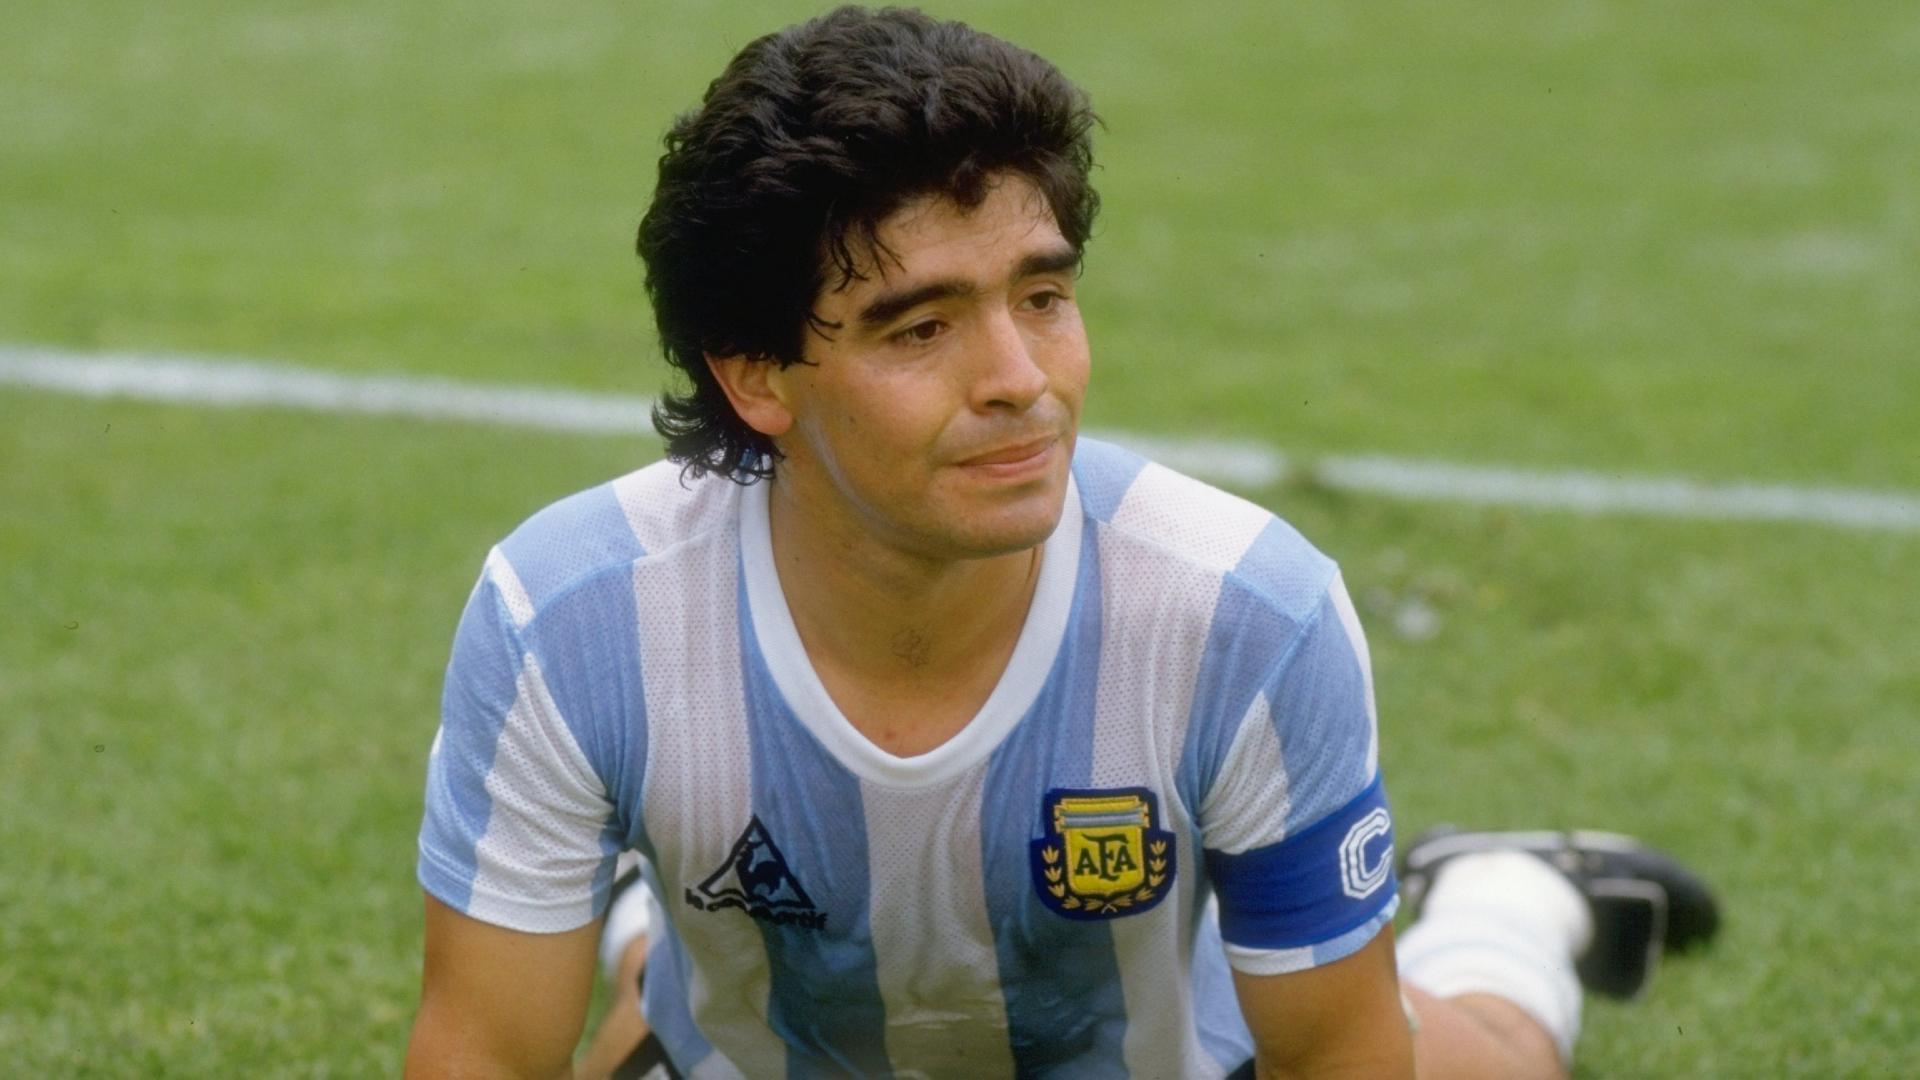 Maradona at 60: The star of Mexico 1986 – and the World Cup handball king